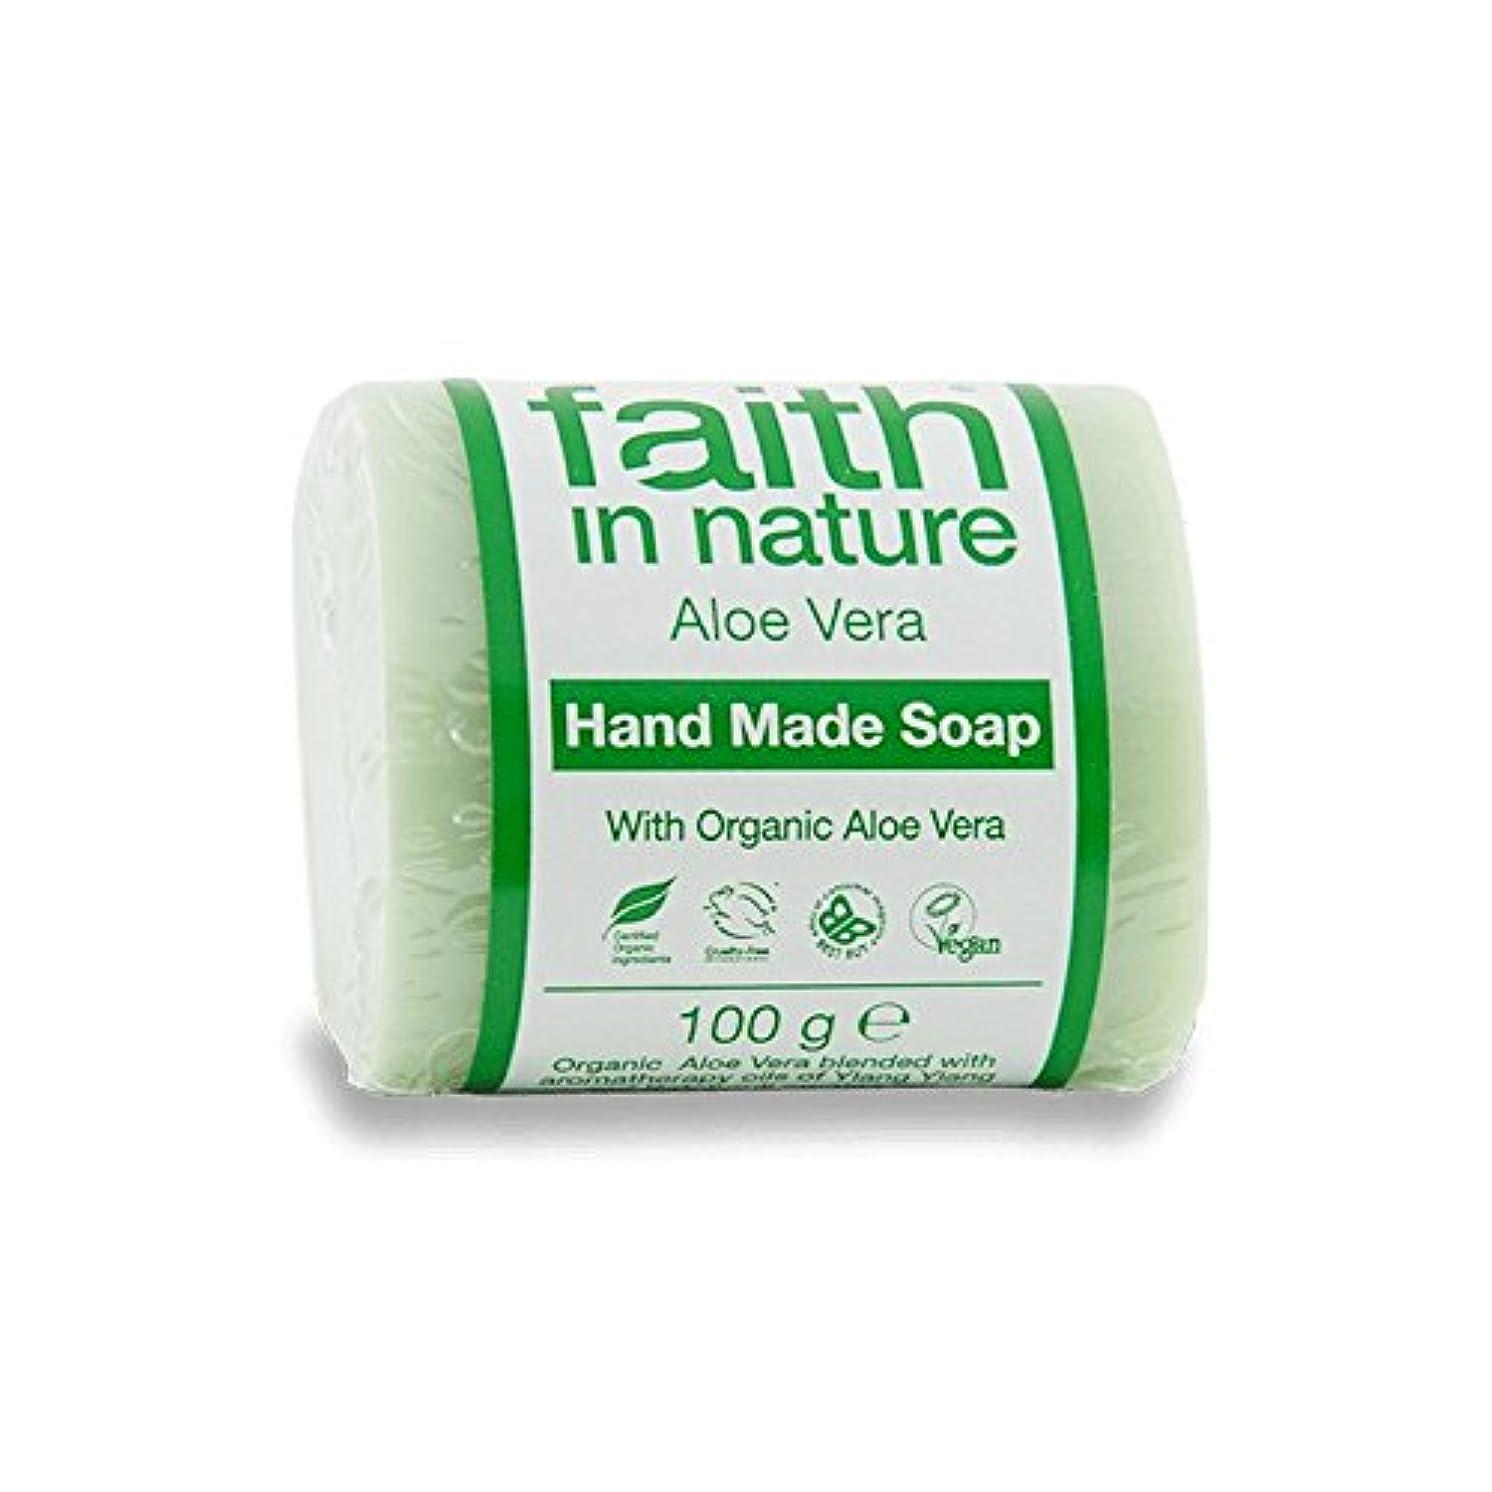 Faith in Nature Aloe Vera with Ylang Ylang Soap 100g (Pack of 6) - イランイランソープ100グラムと自然のアロエベラの信仰 (x6) [並行輸入品]